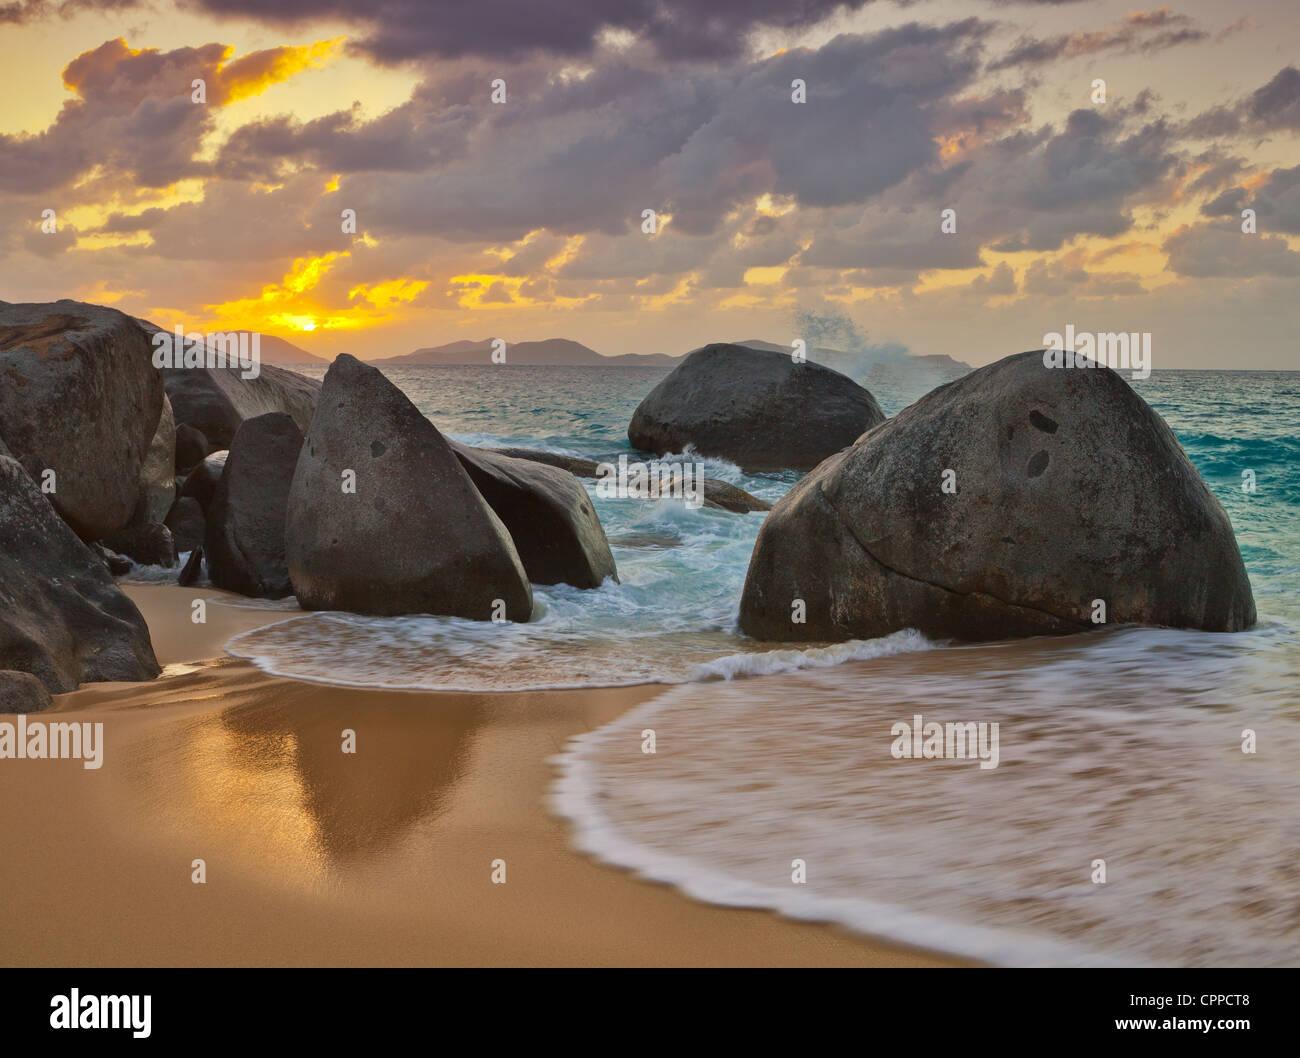 Virgin Gorda, British Virgin Islands, Caribbean Boulders awash in the surf  of Little Trunk